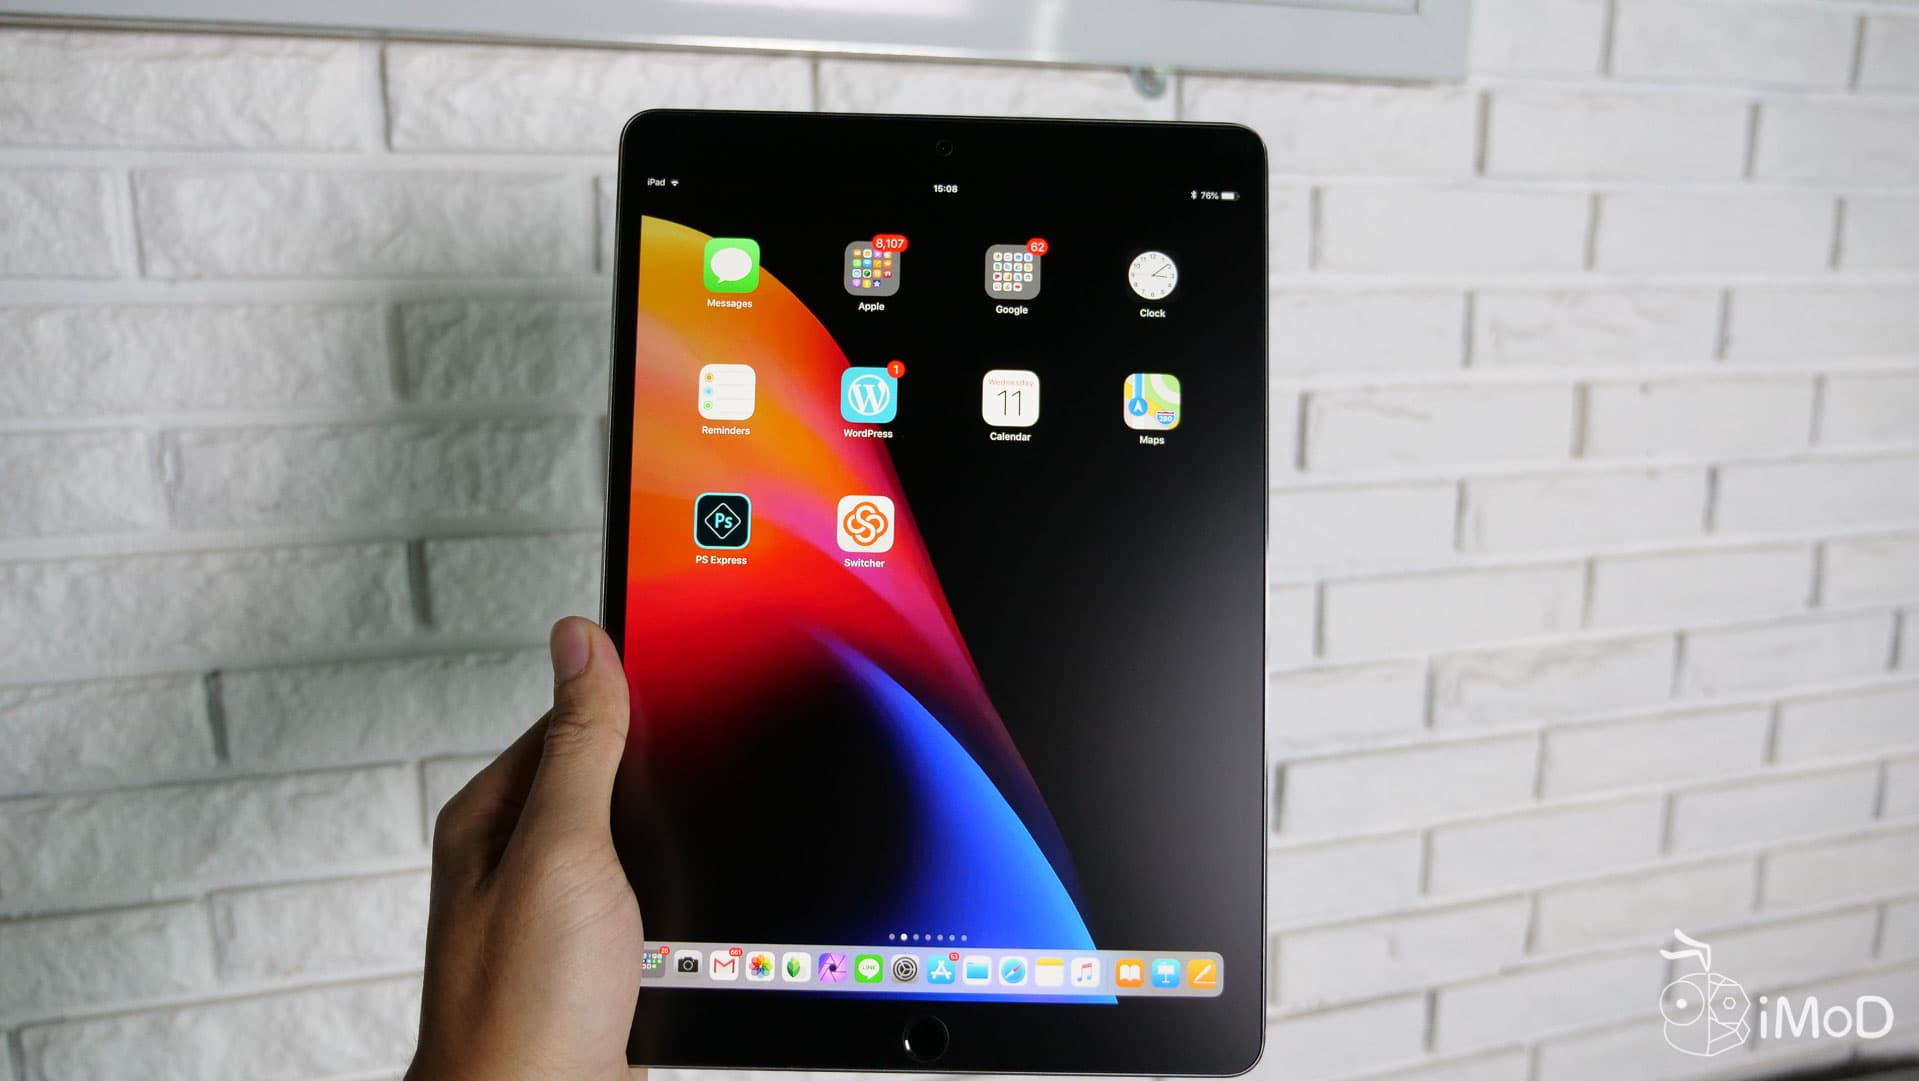 Focus Ipad Pro 10.5 Smart Note 2584